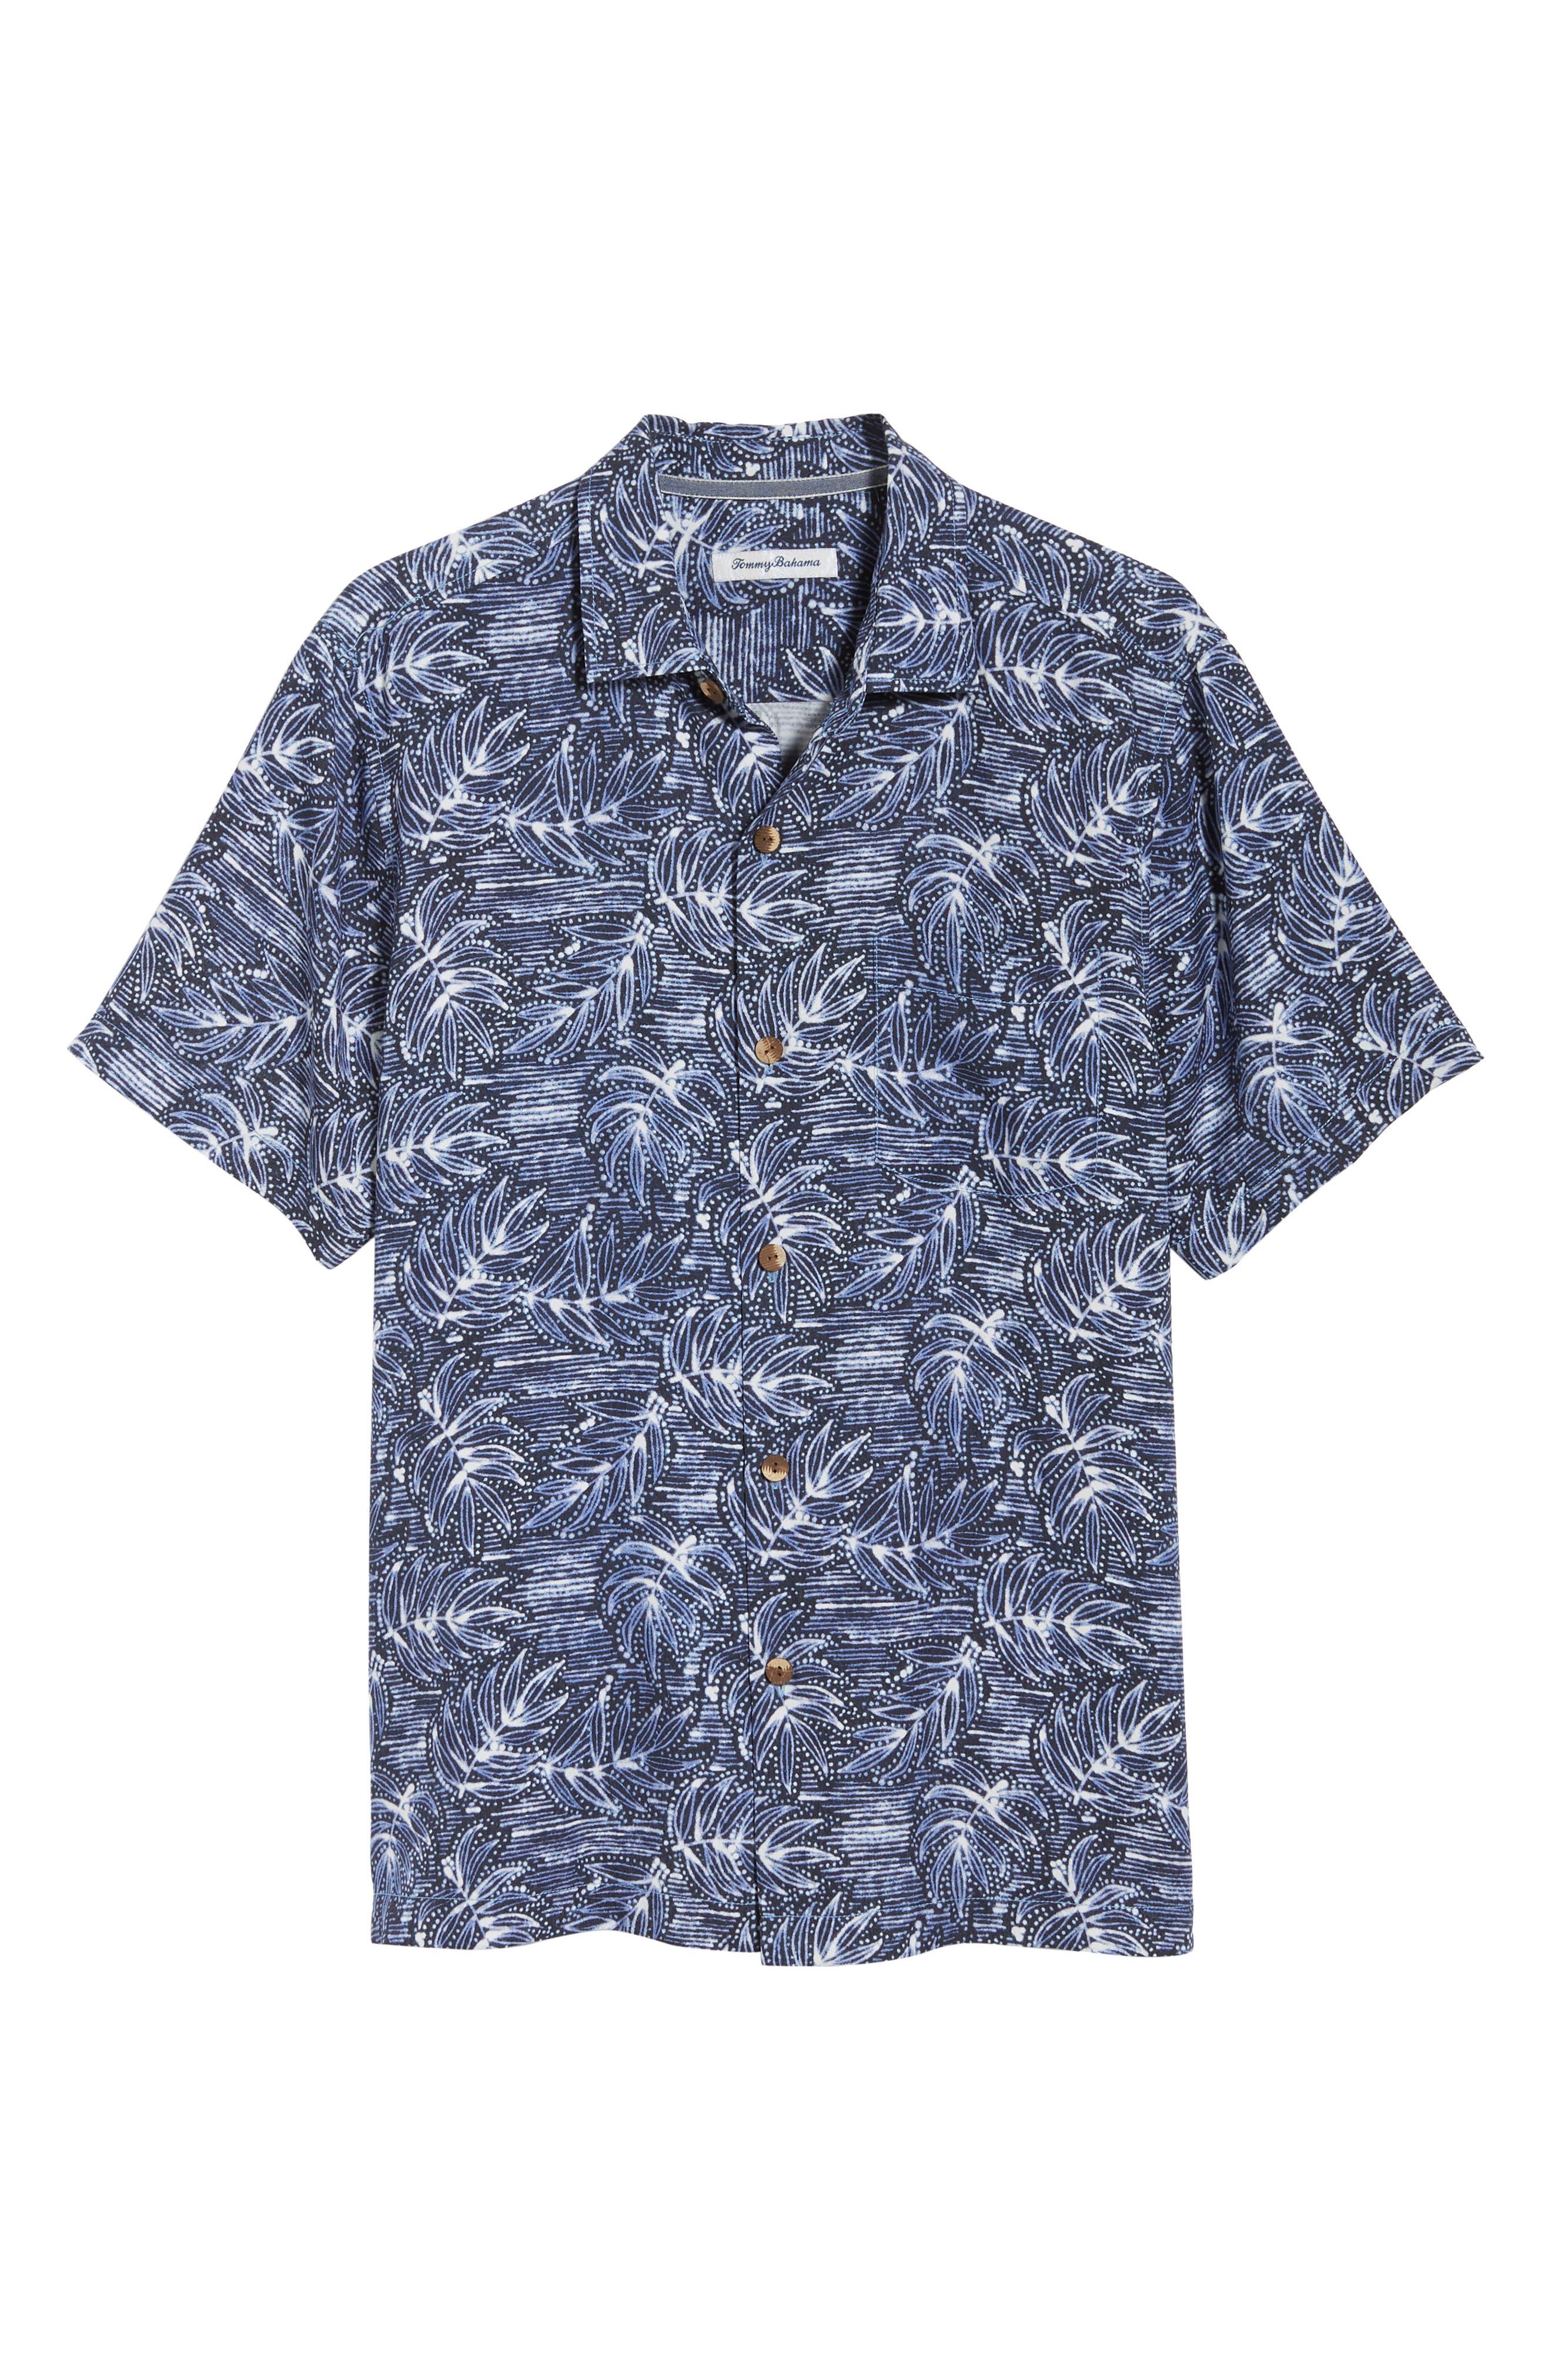 Bueno Batik Sport Shirt,                             Alternate thumbnail 6, color,                             BLUE JEAN